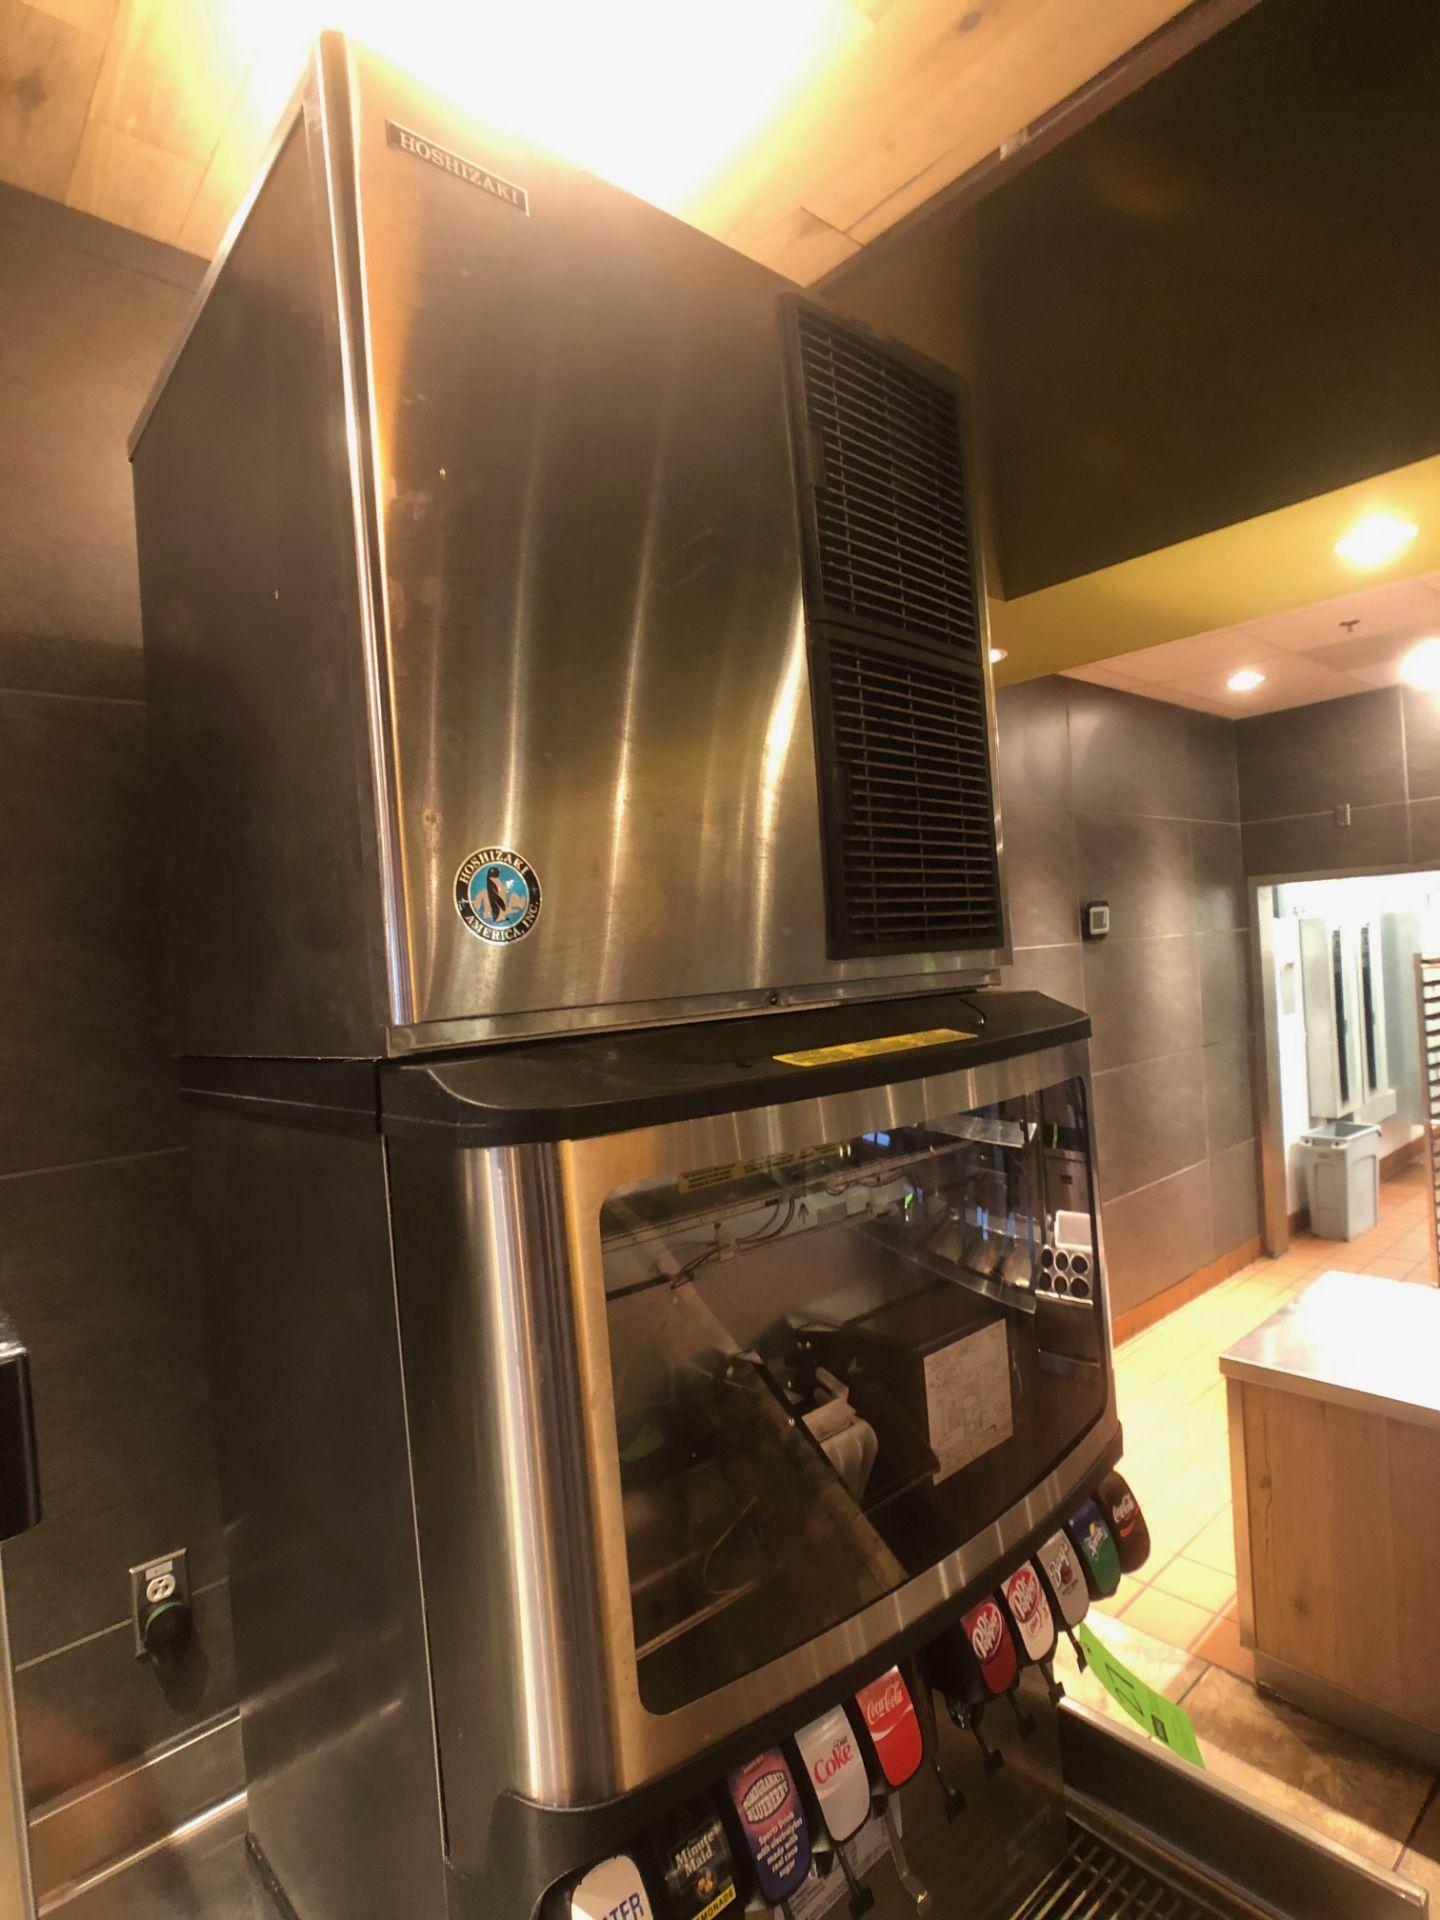 Manitowoc Beverage Systems 10-Valve Soft Drink Dispenser, Model SV250, S/N 610202454, with Hoshizaki - Image 5 of 10